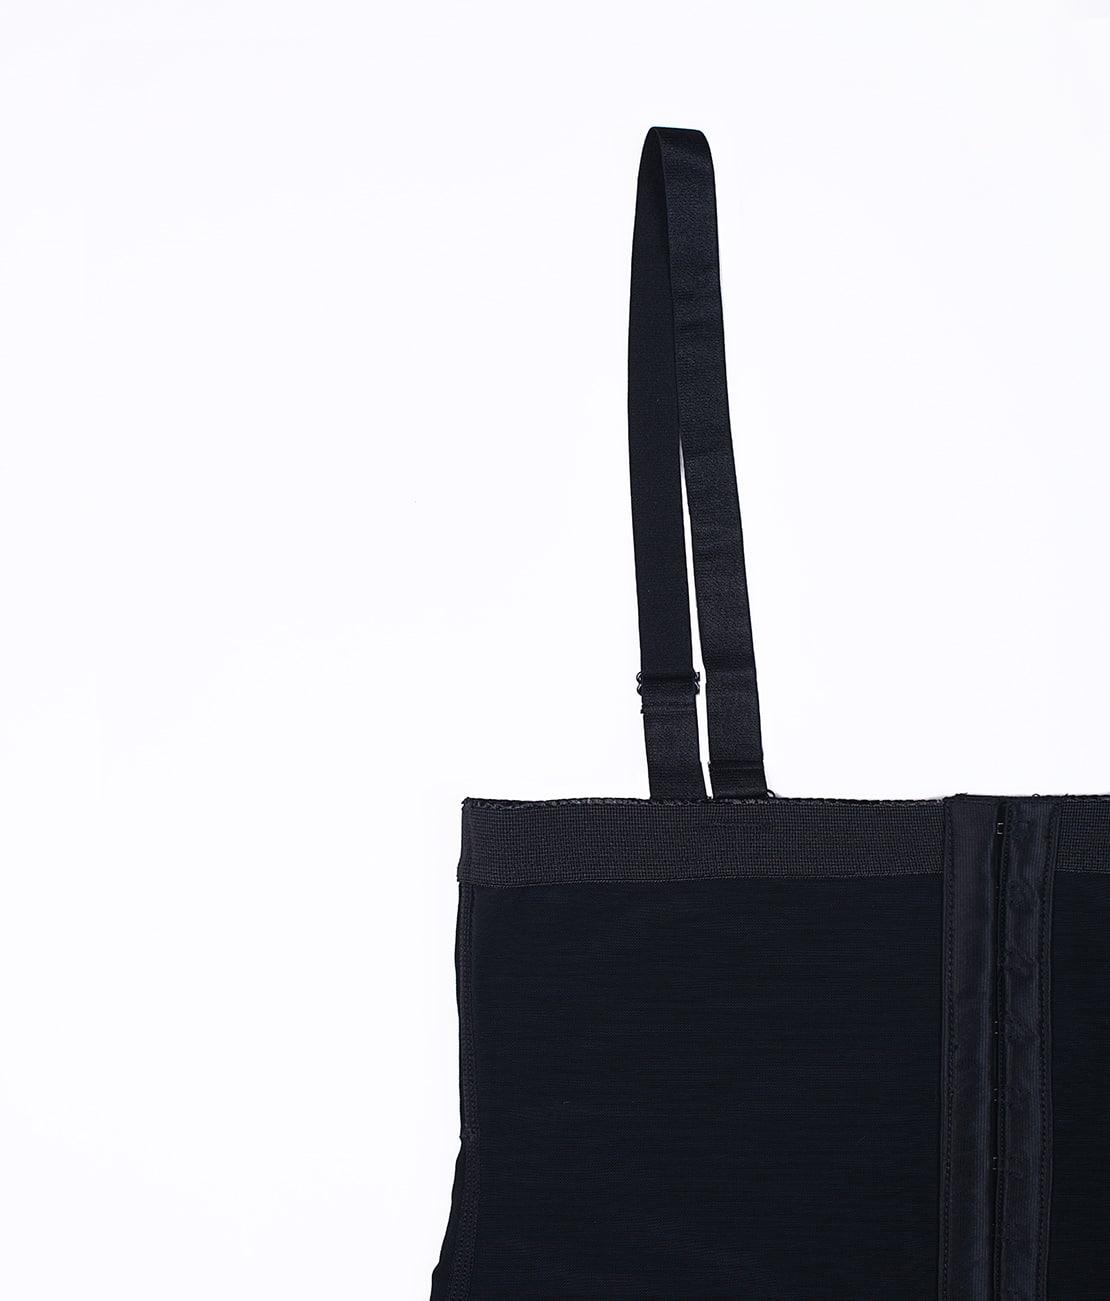 Combinaison Gainante Dentelle Noire Packshot Detail 2